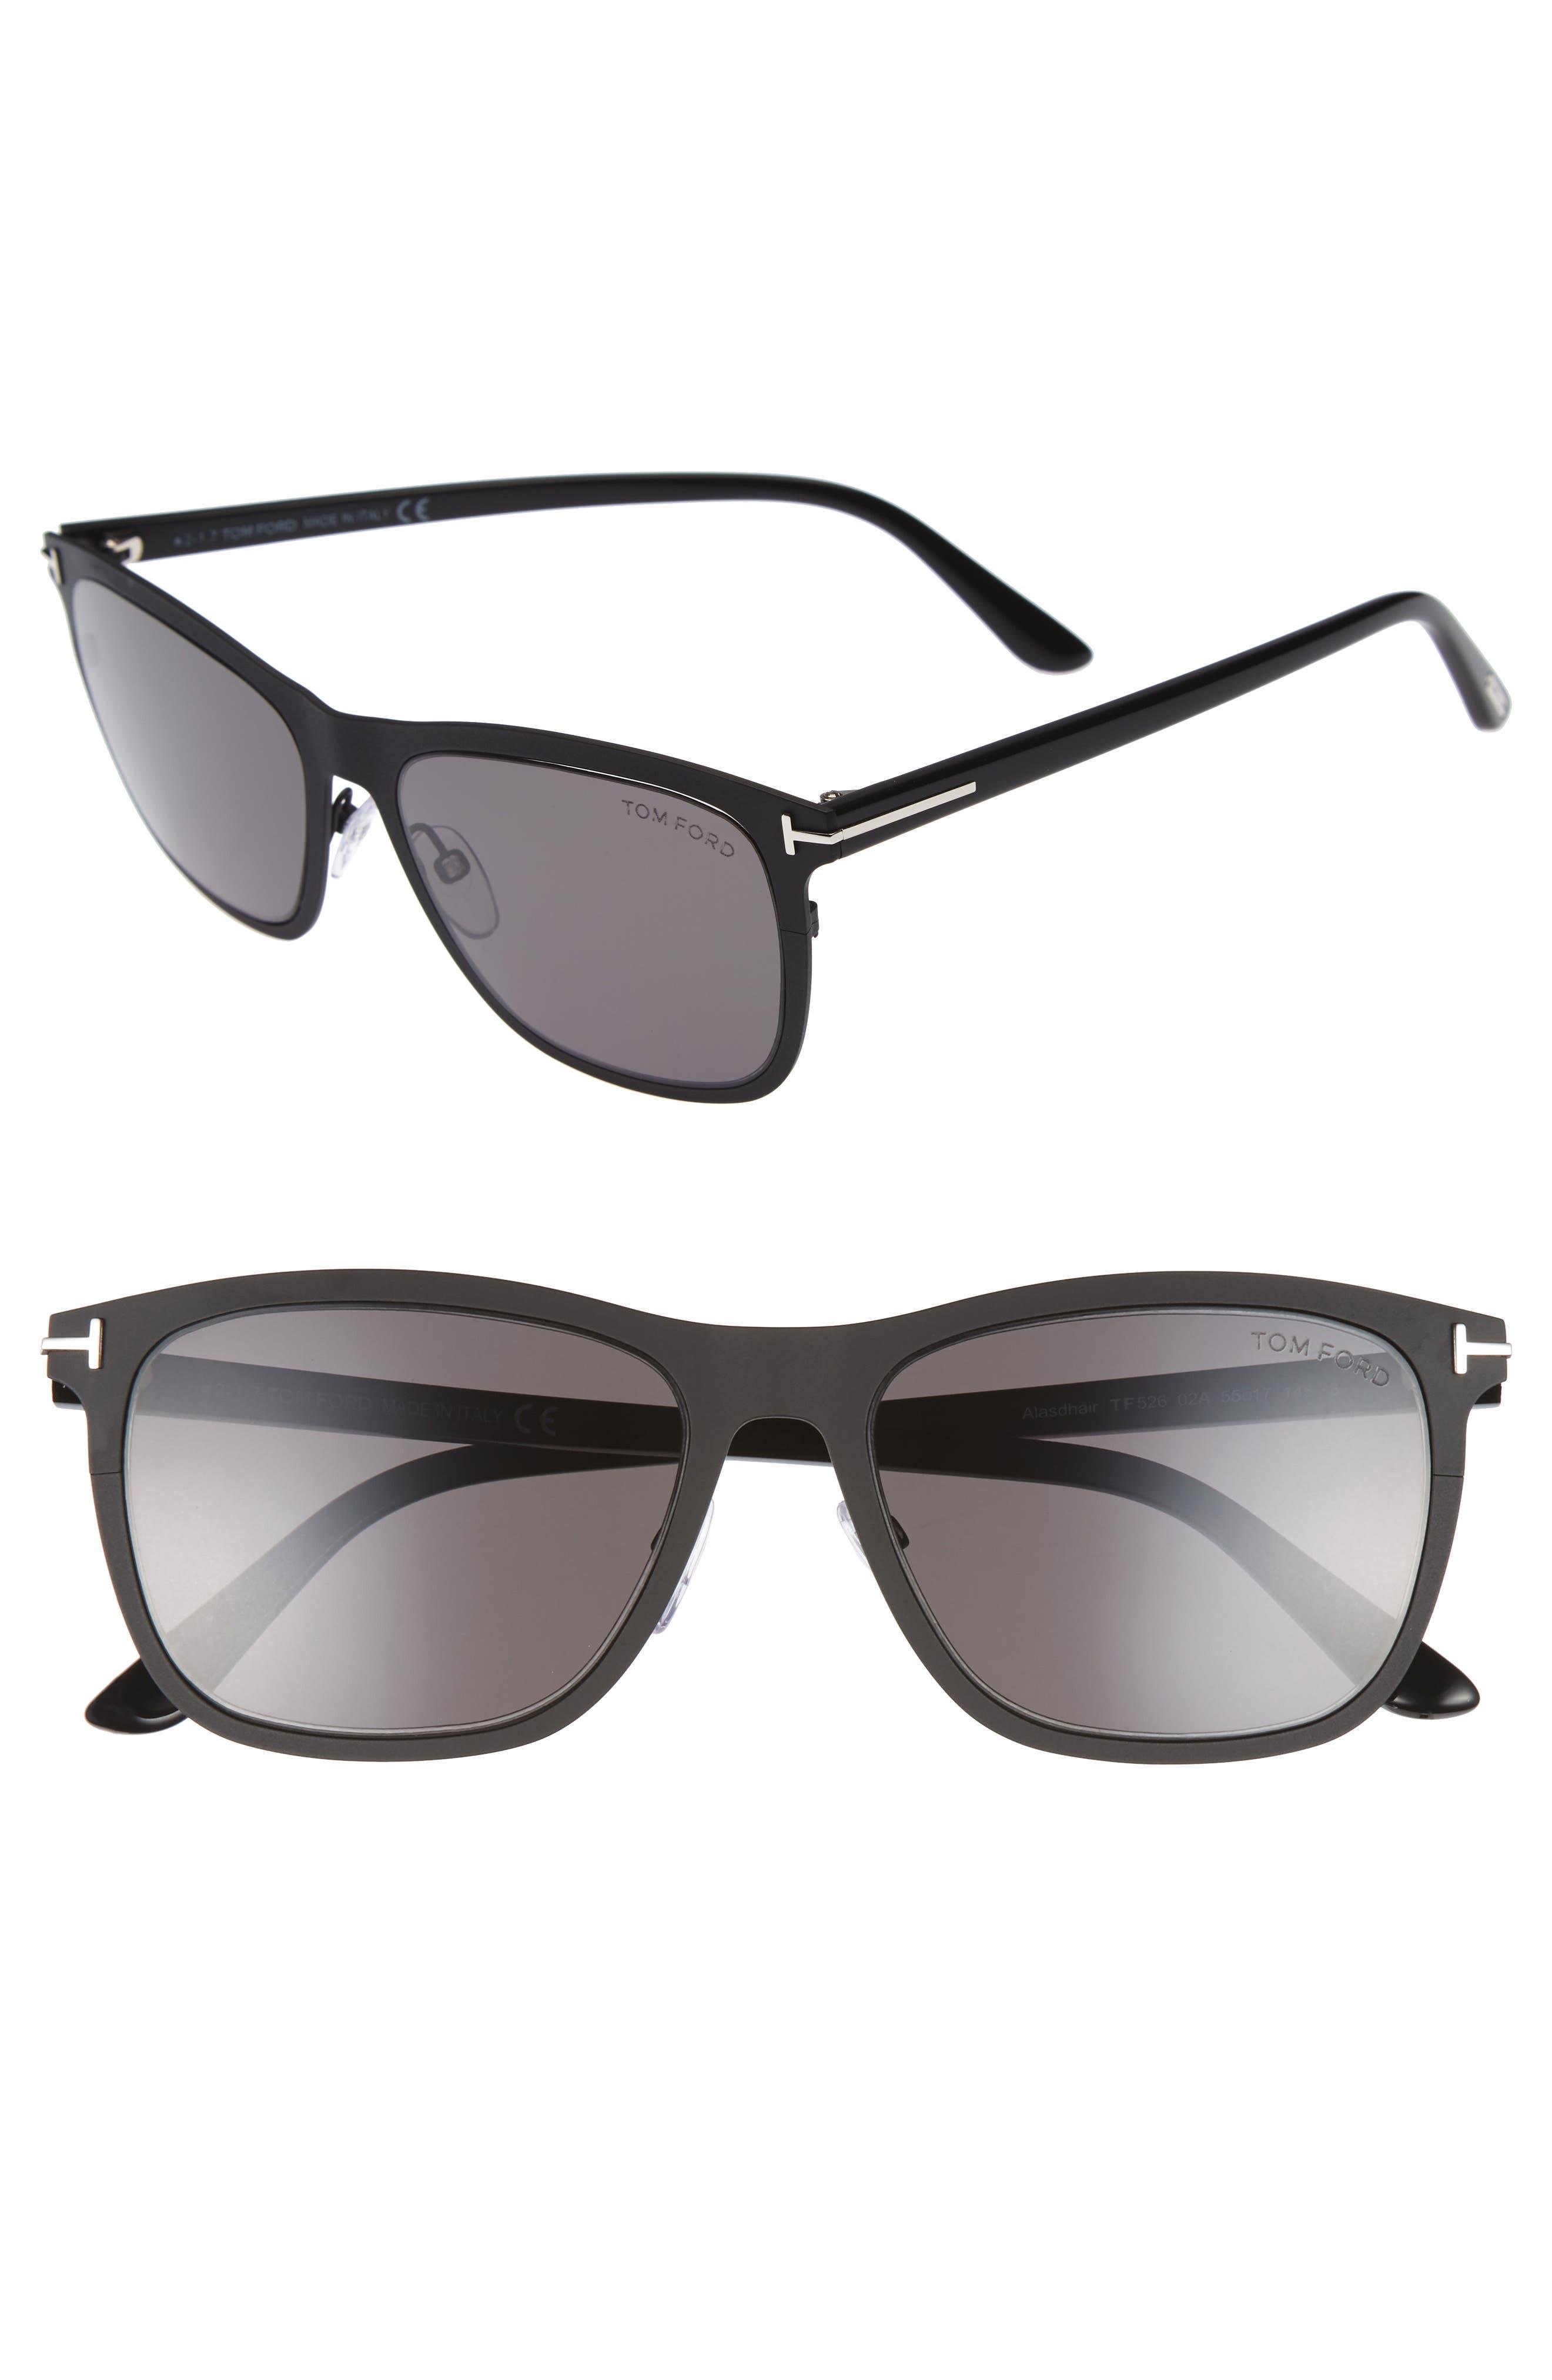 Tom Ford Alasdhair 55mm Sunglasses